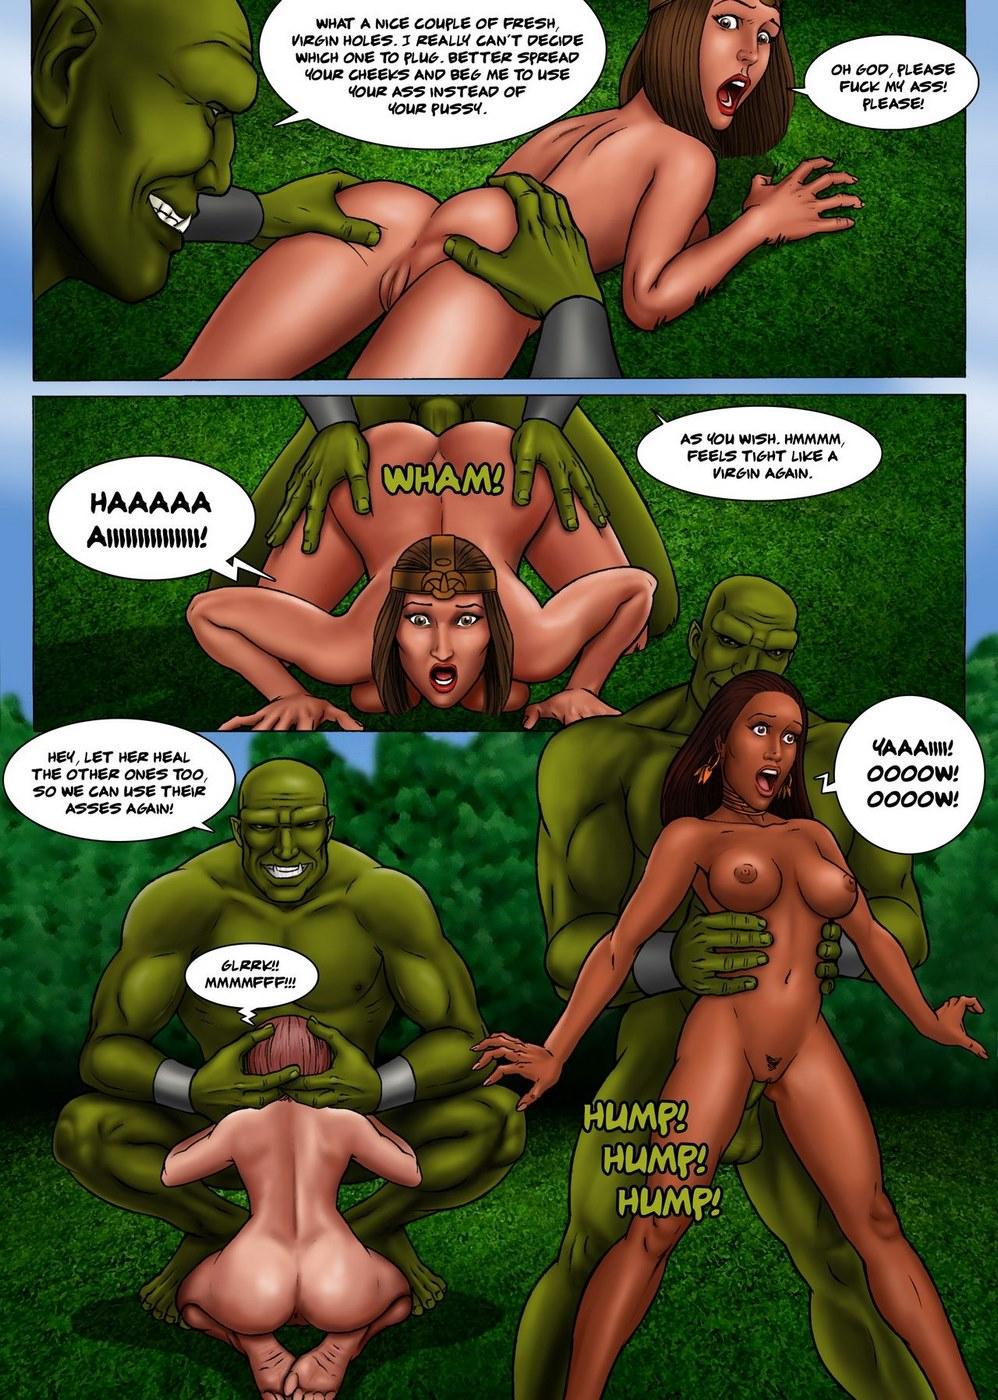 Baldur\'s Gape- Ogres assfuck their enemies dry best - part 2